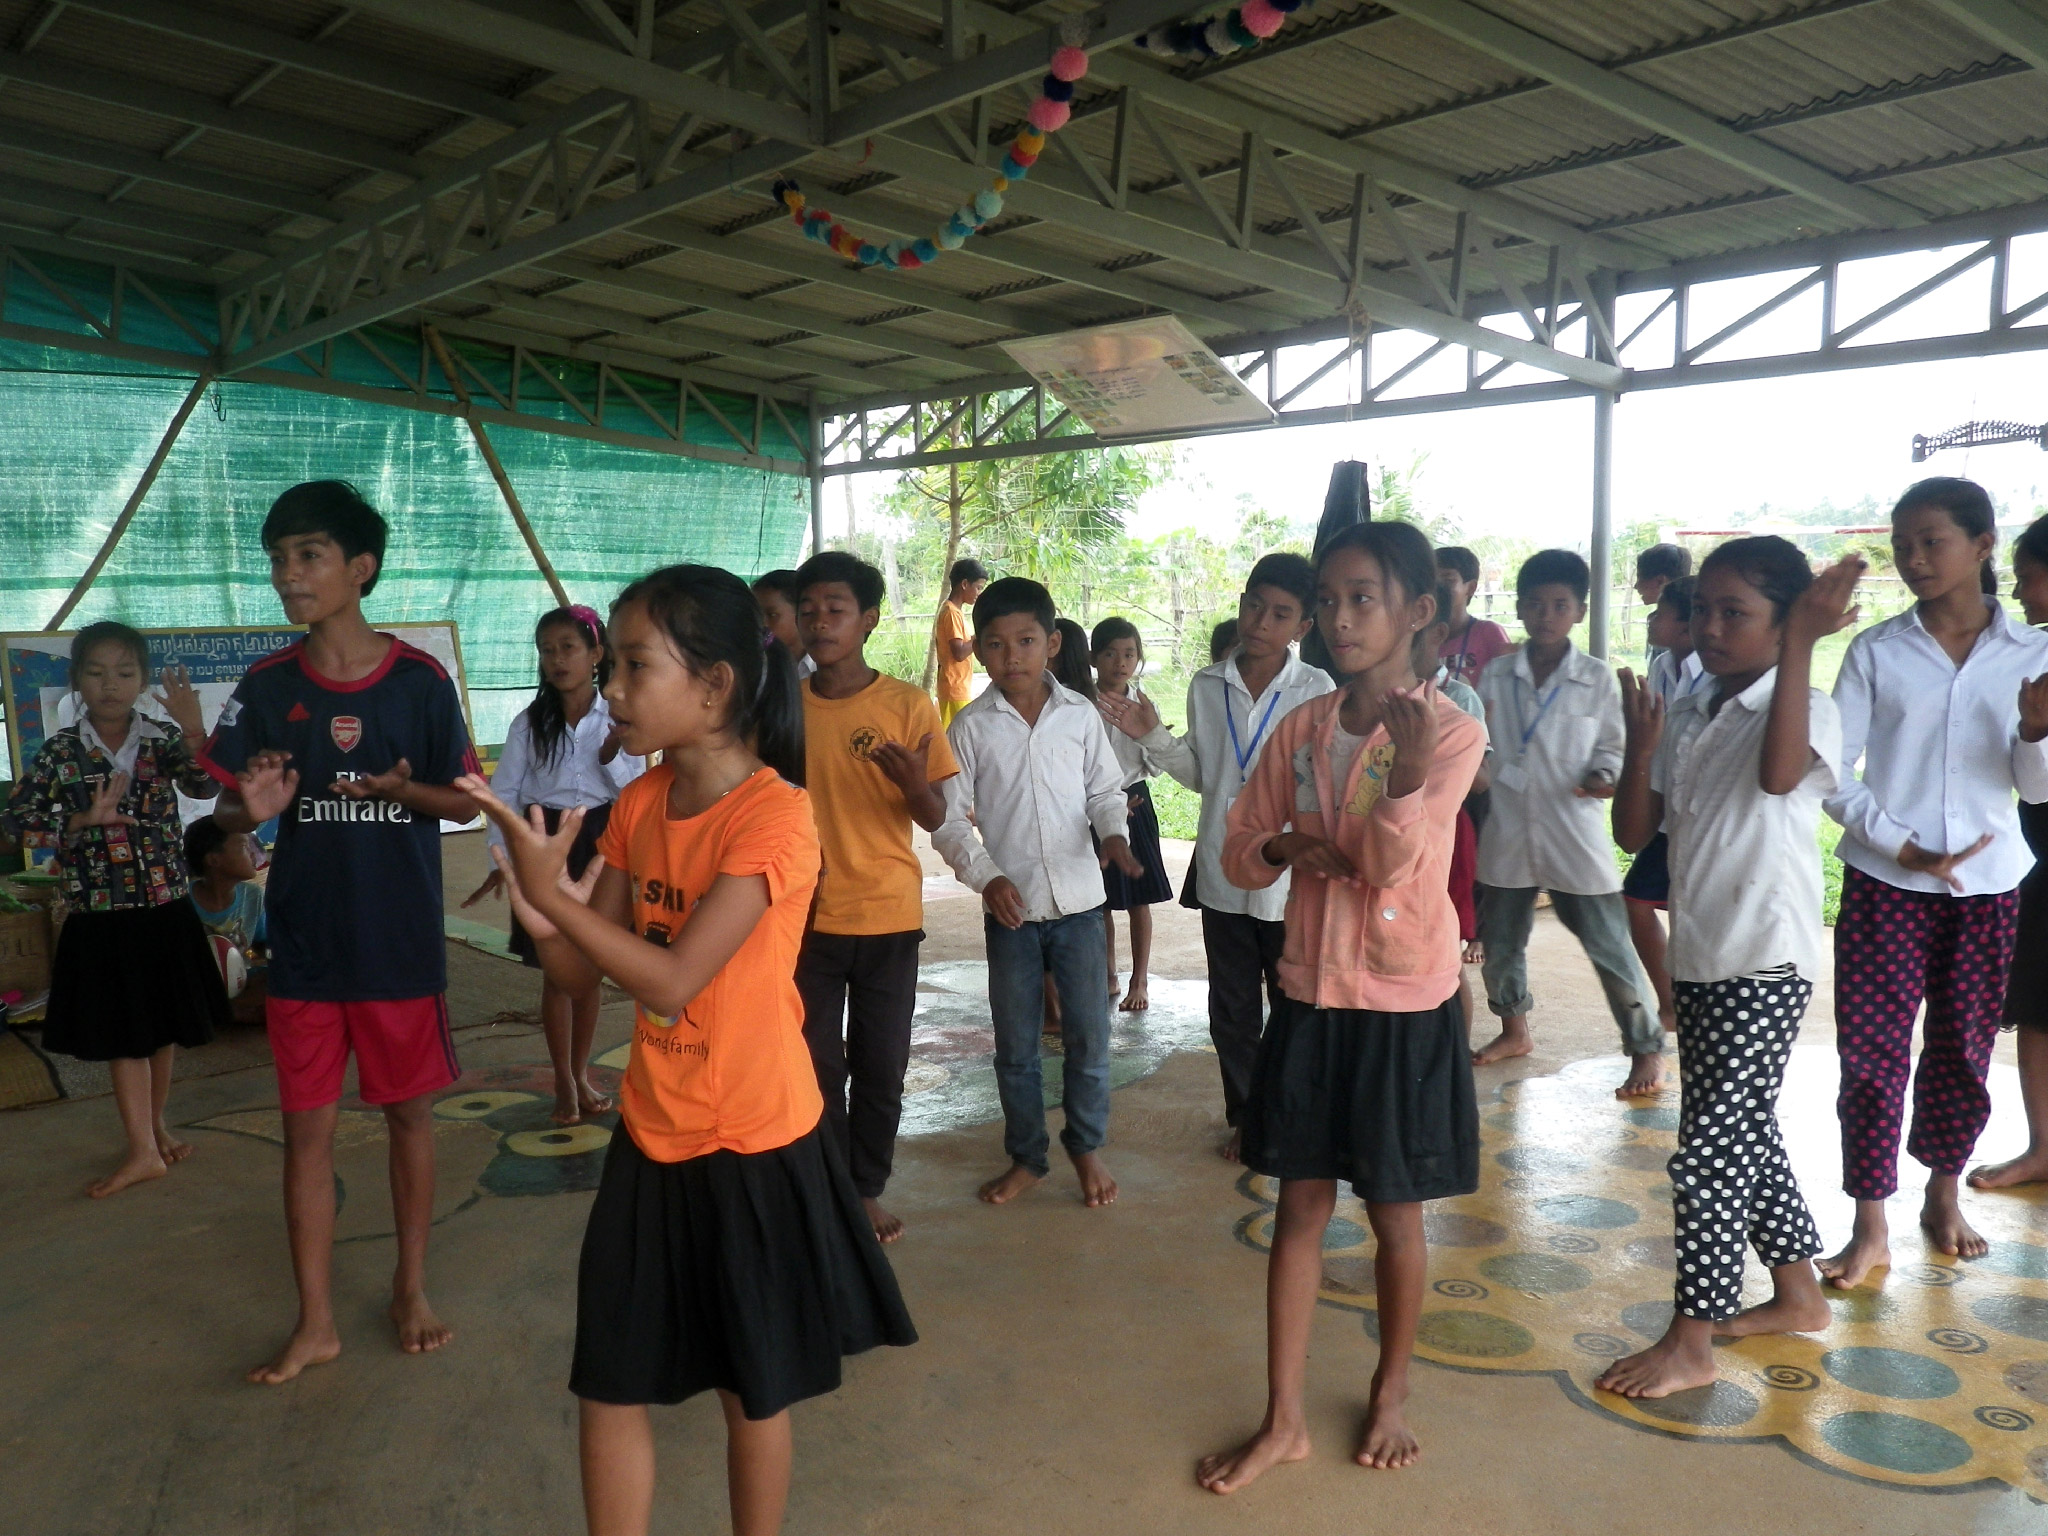 Initiation à la danse khmère